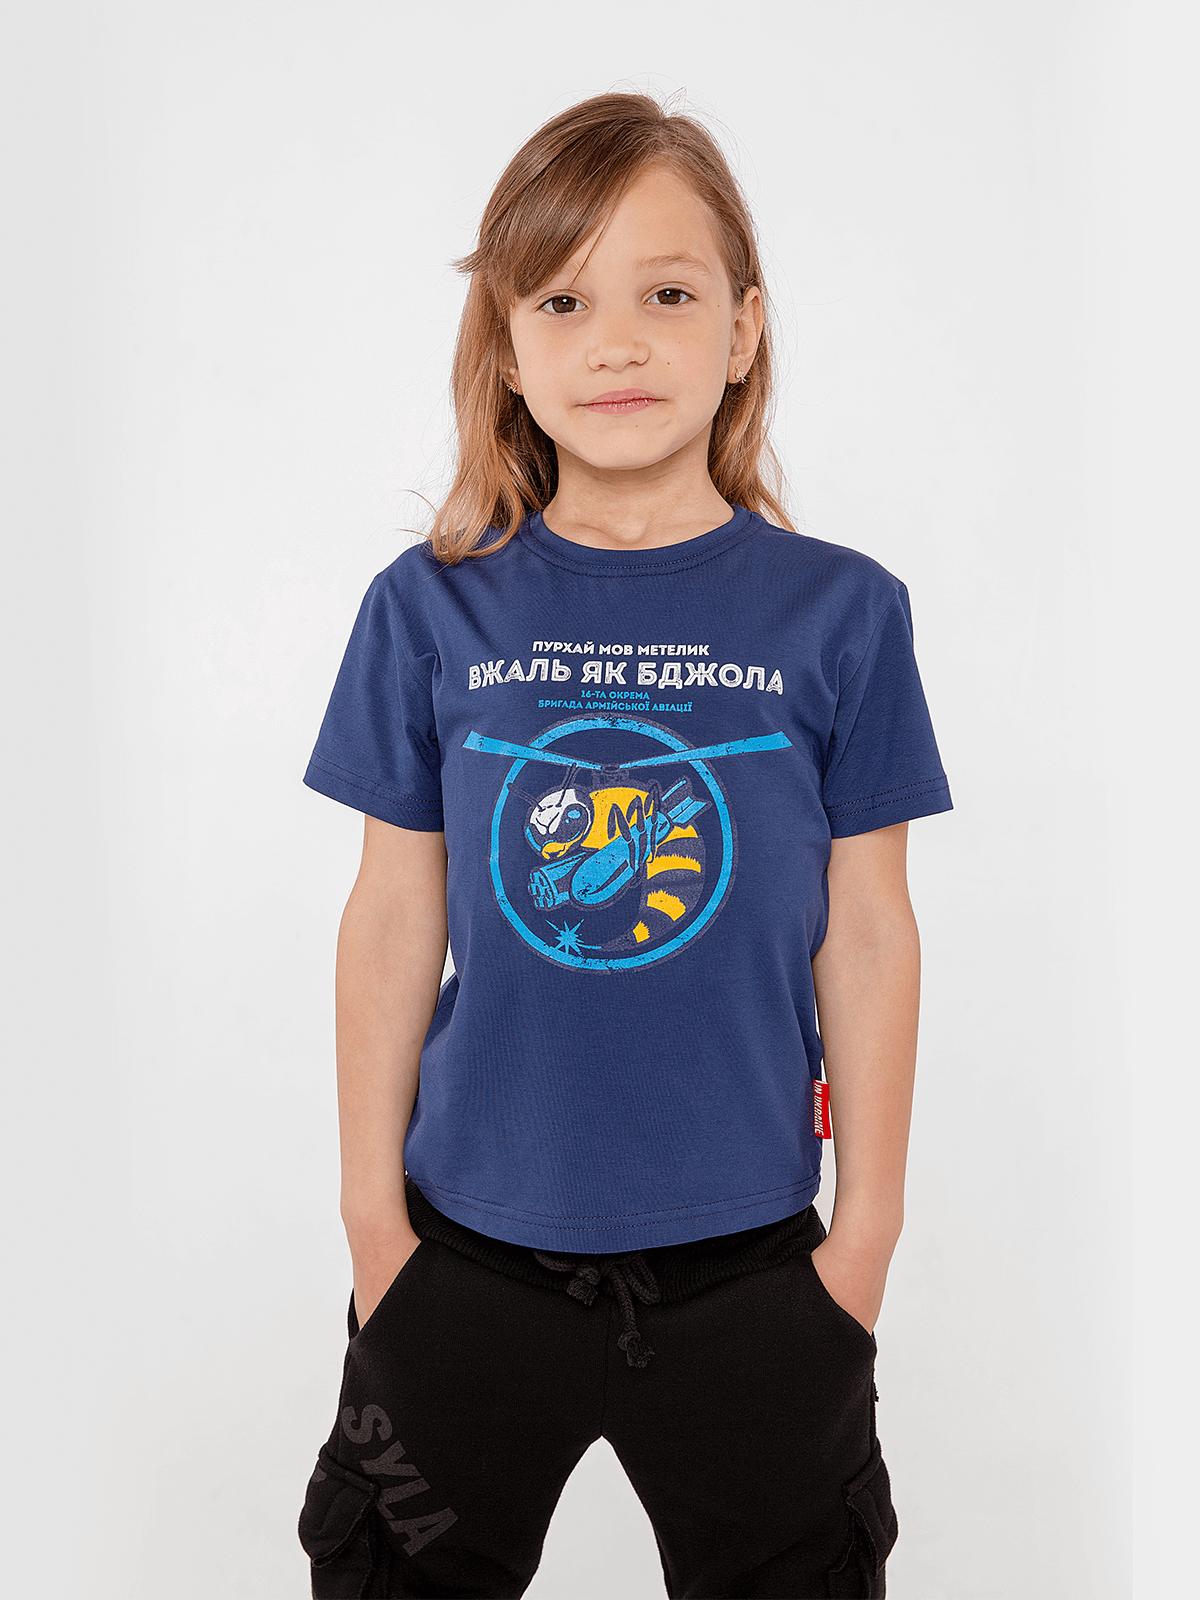 Kids T-Shirt Bee. Color navy blue. .